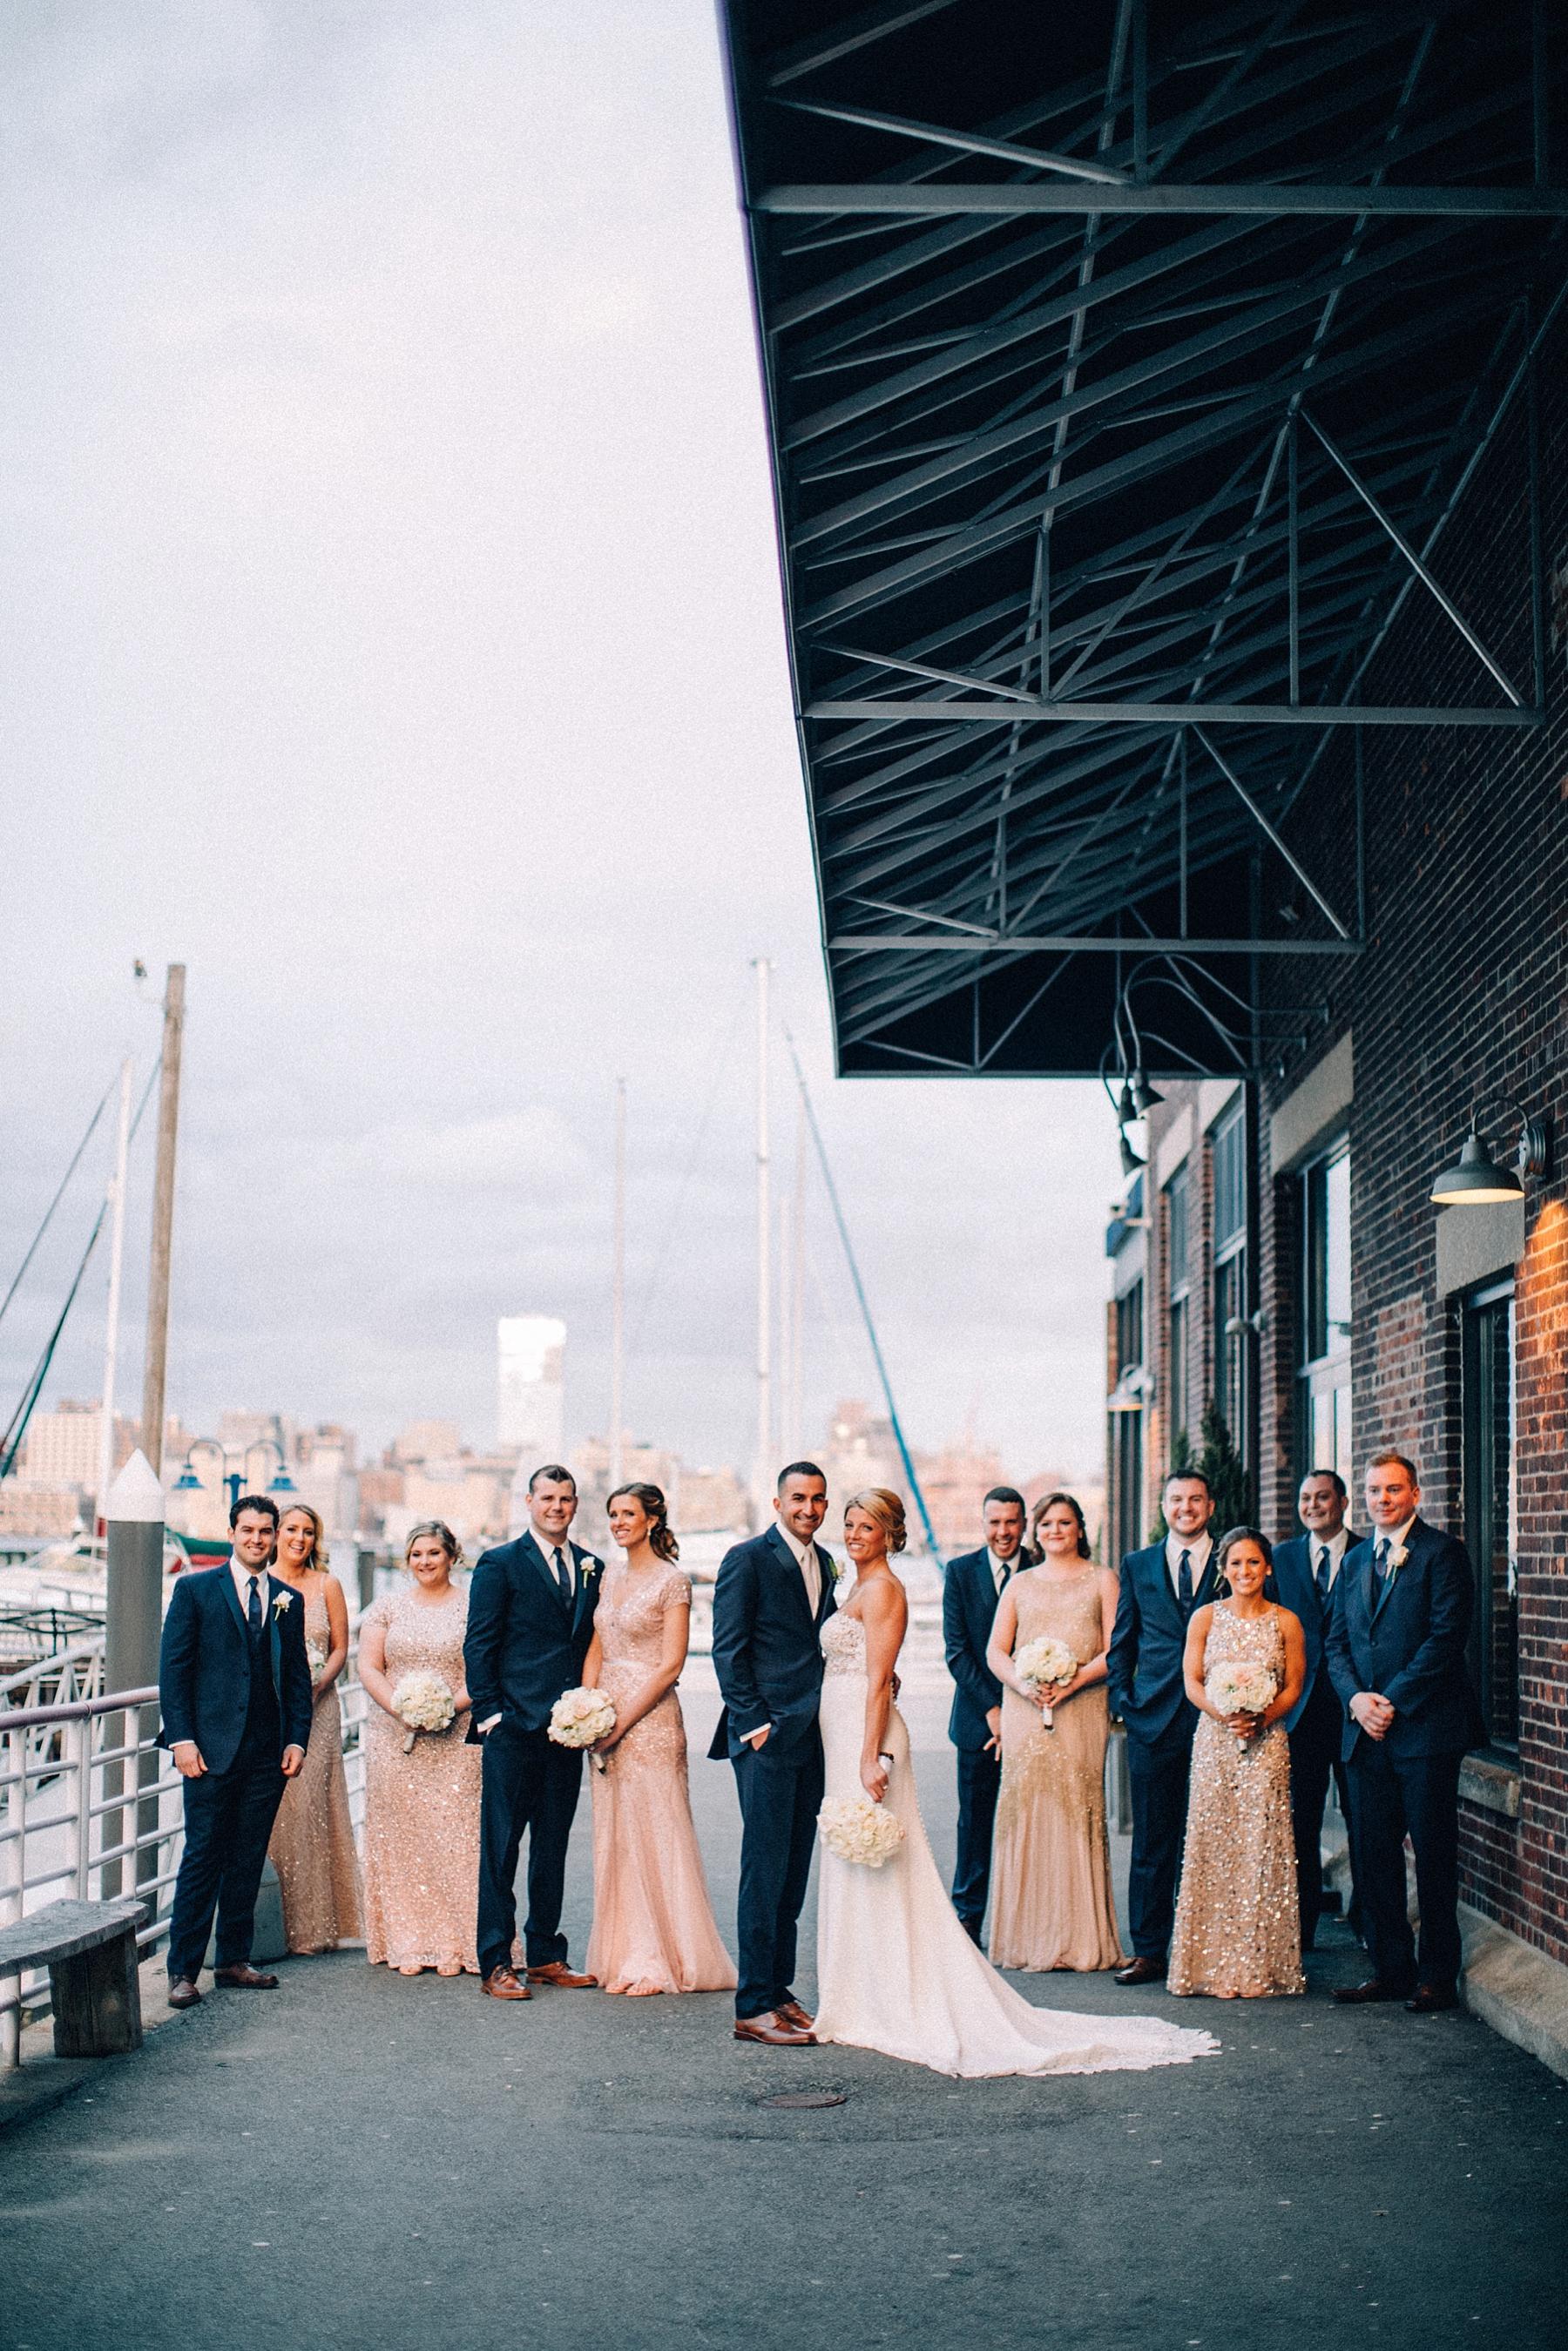 jersey-city-nj-wedding-photographer-top_0031.jpg